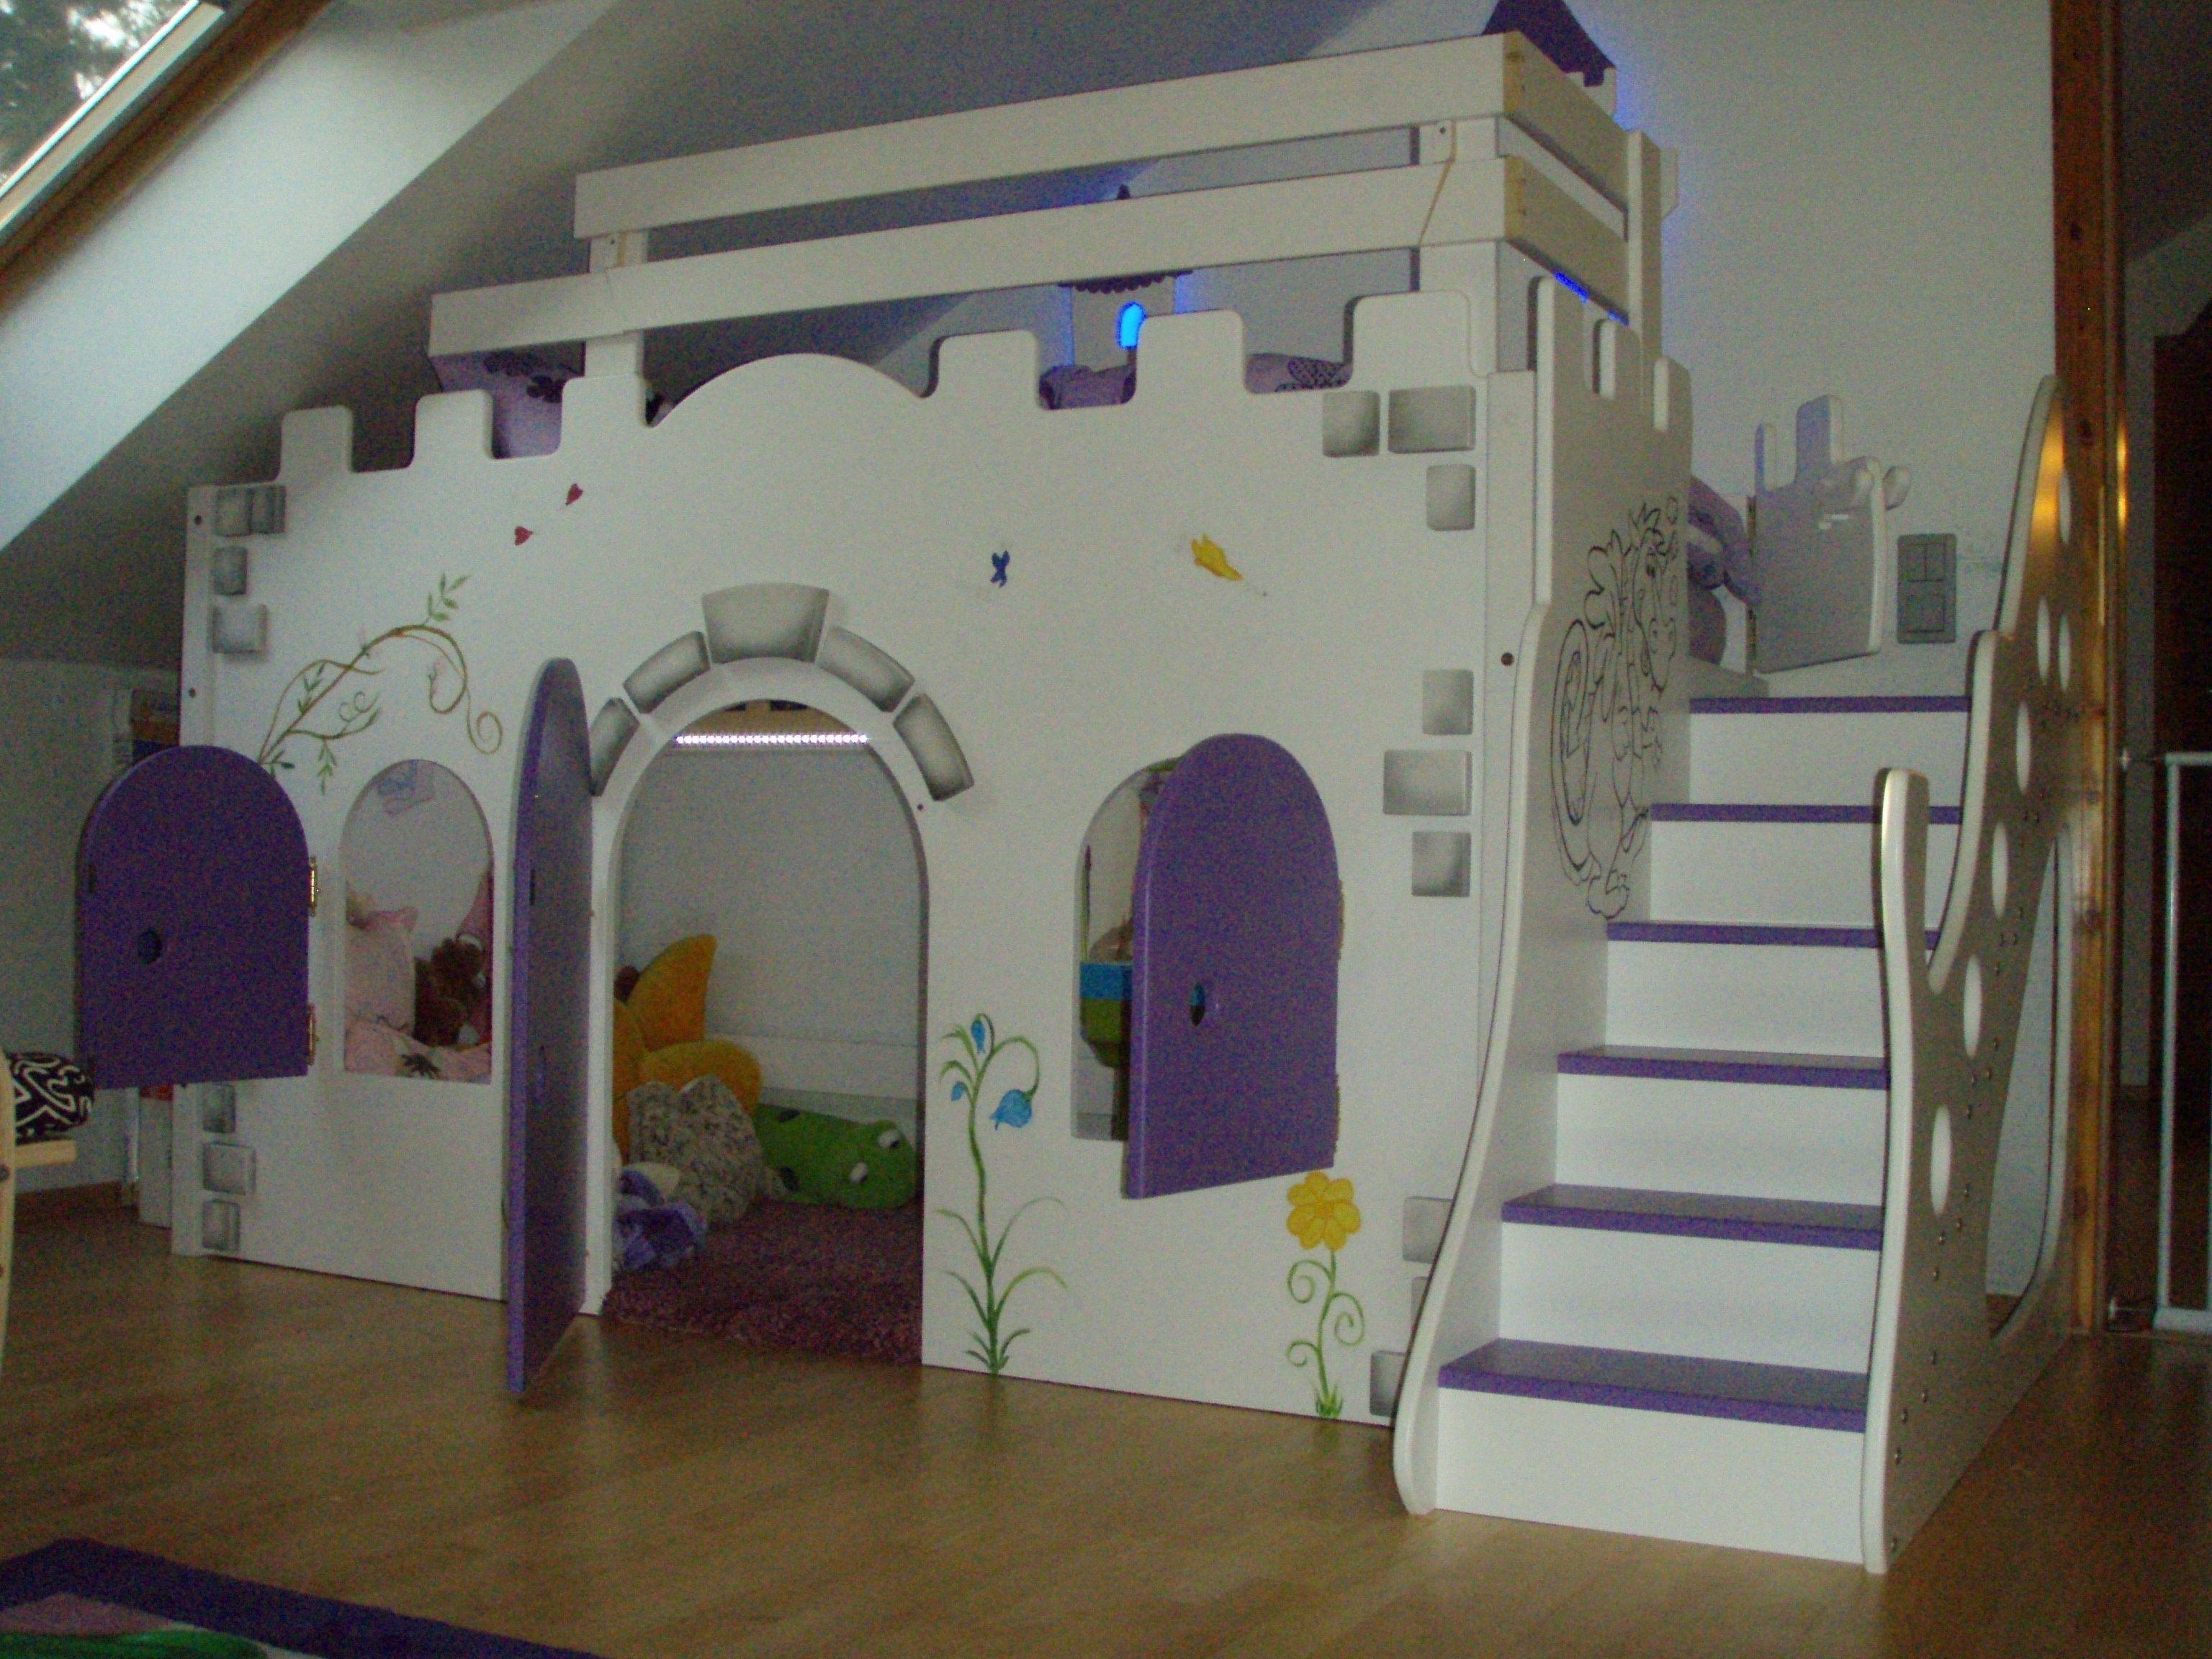 Hochbett Burg Cool Kinderbett Hochbett Traum Burg